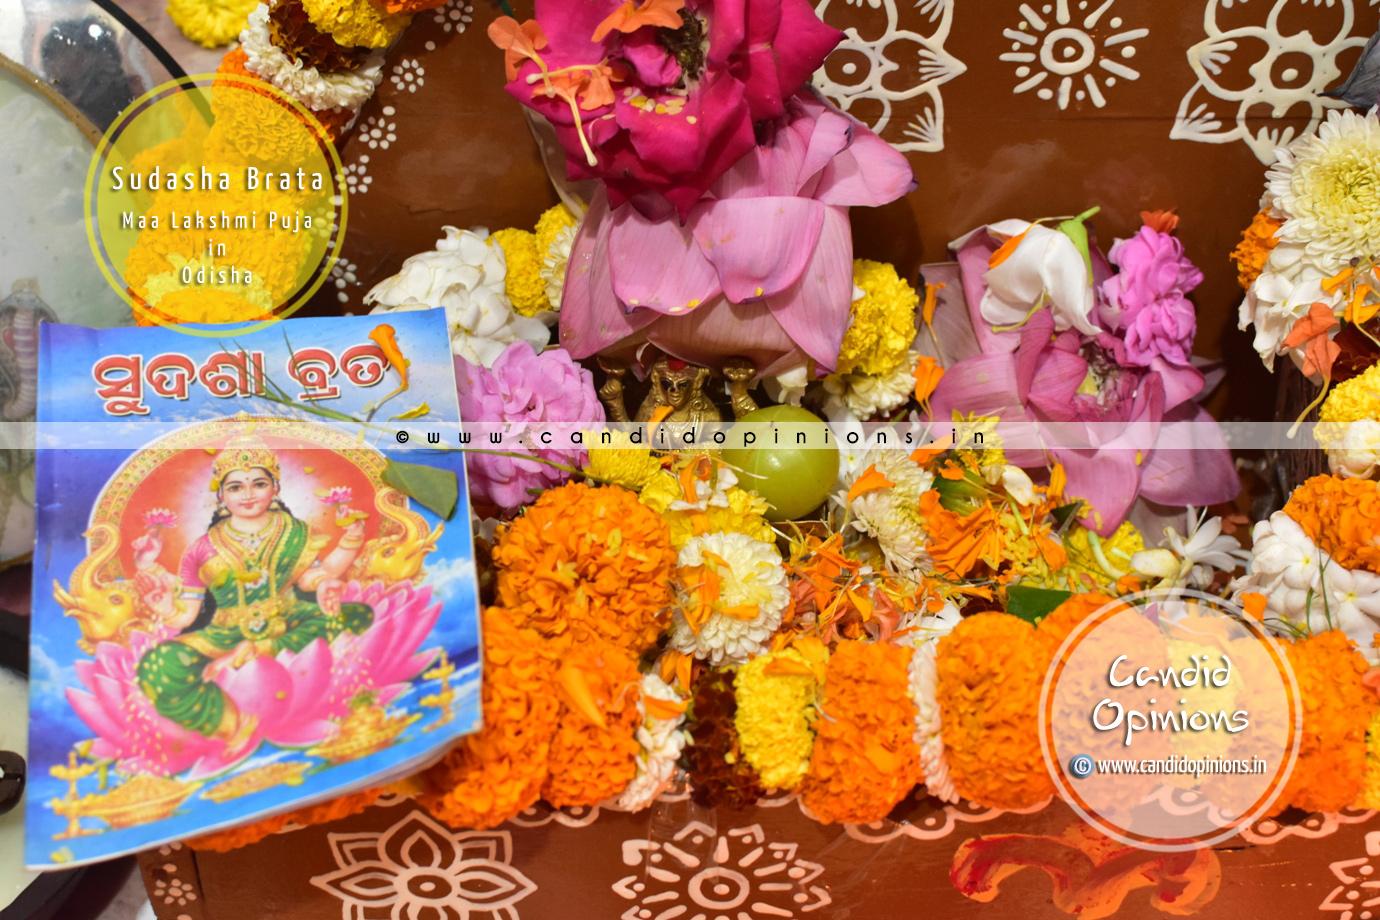 Sudasha Brata - A Fast Observed By Women In Odisha For The